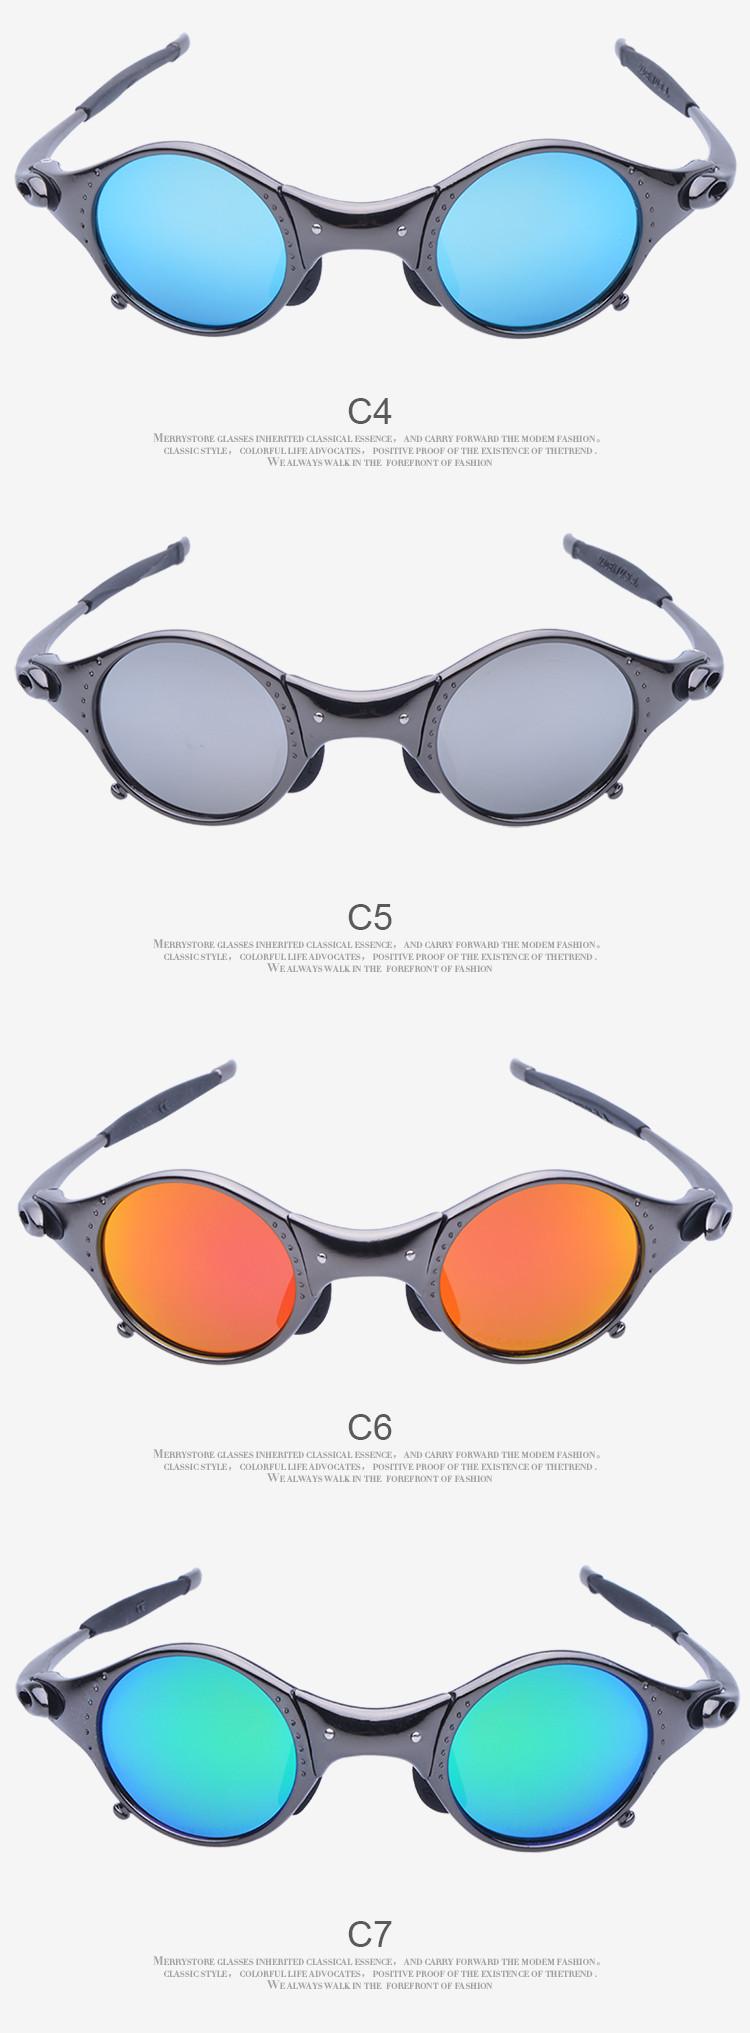 CP001-4_06